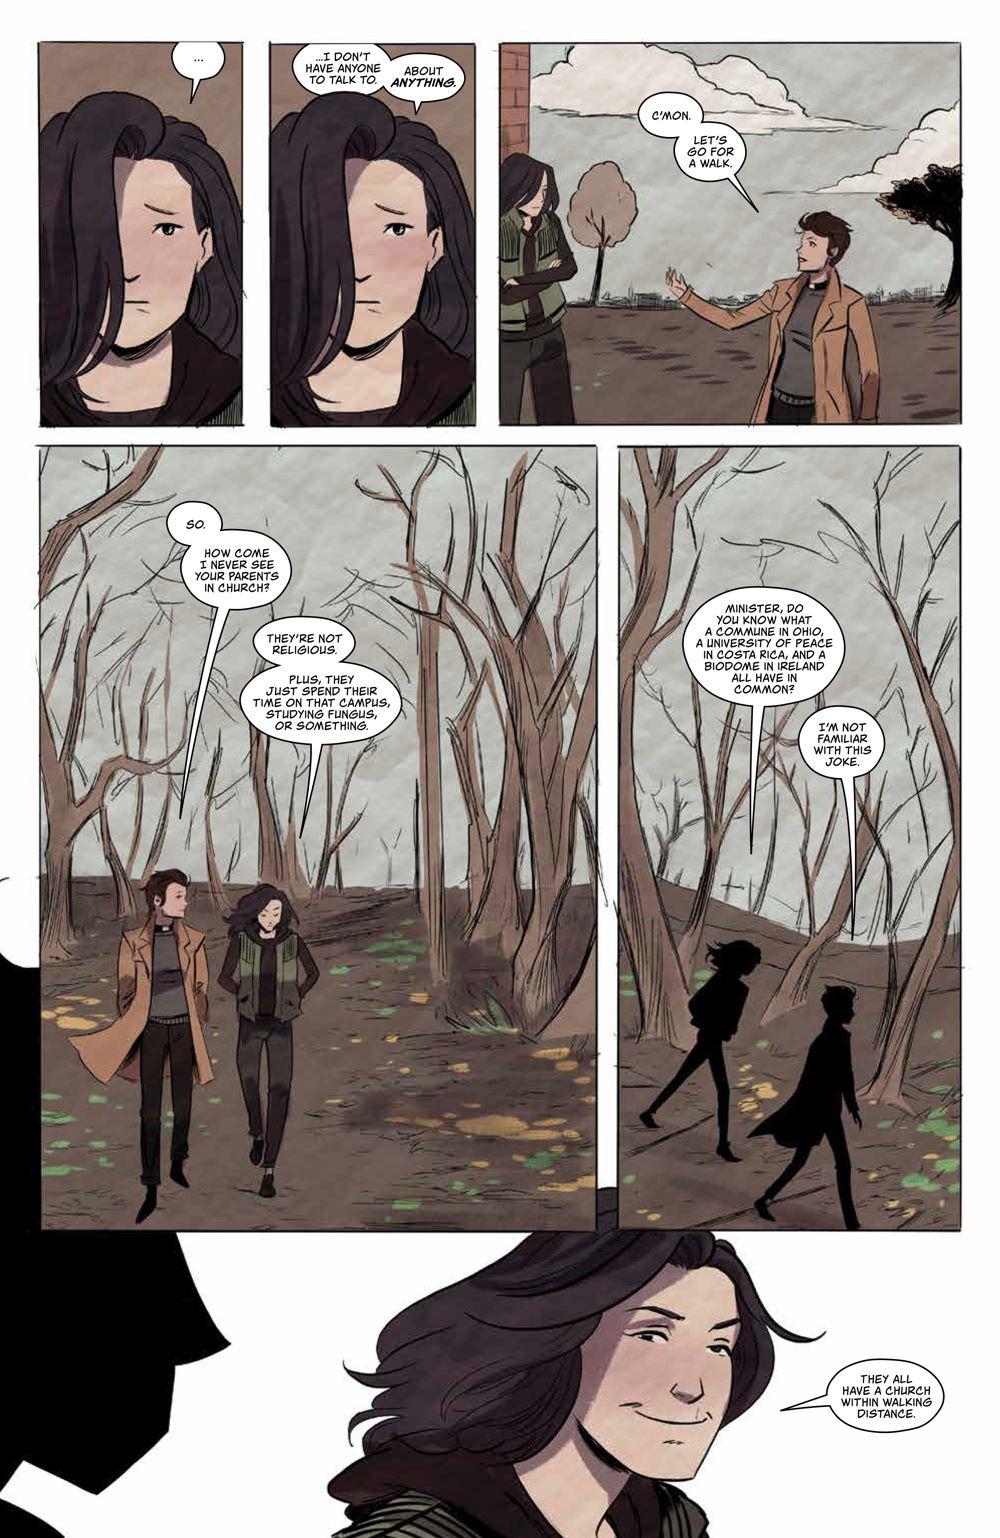 GhostedInLA_v3_SC_PRESS_10 ComicList Previews: GHOSTED IN L.A. VOLUME 3 TP